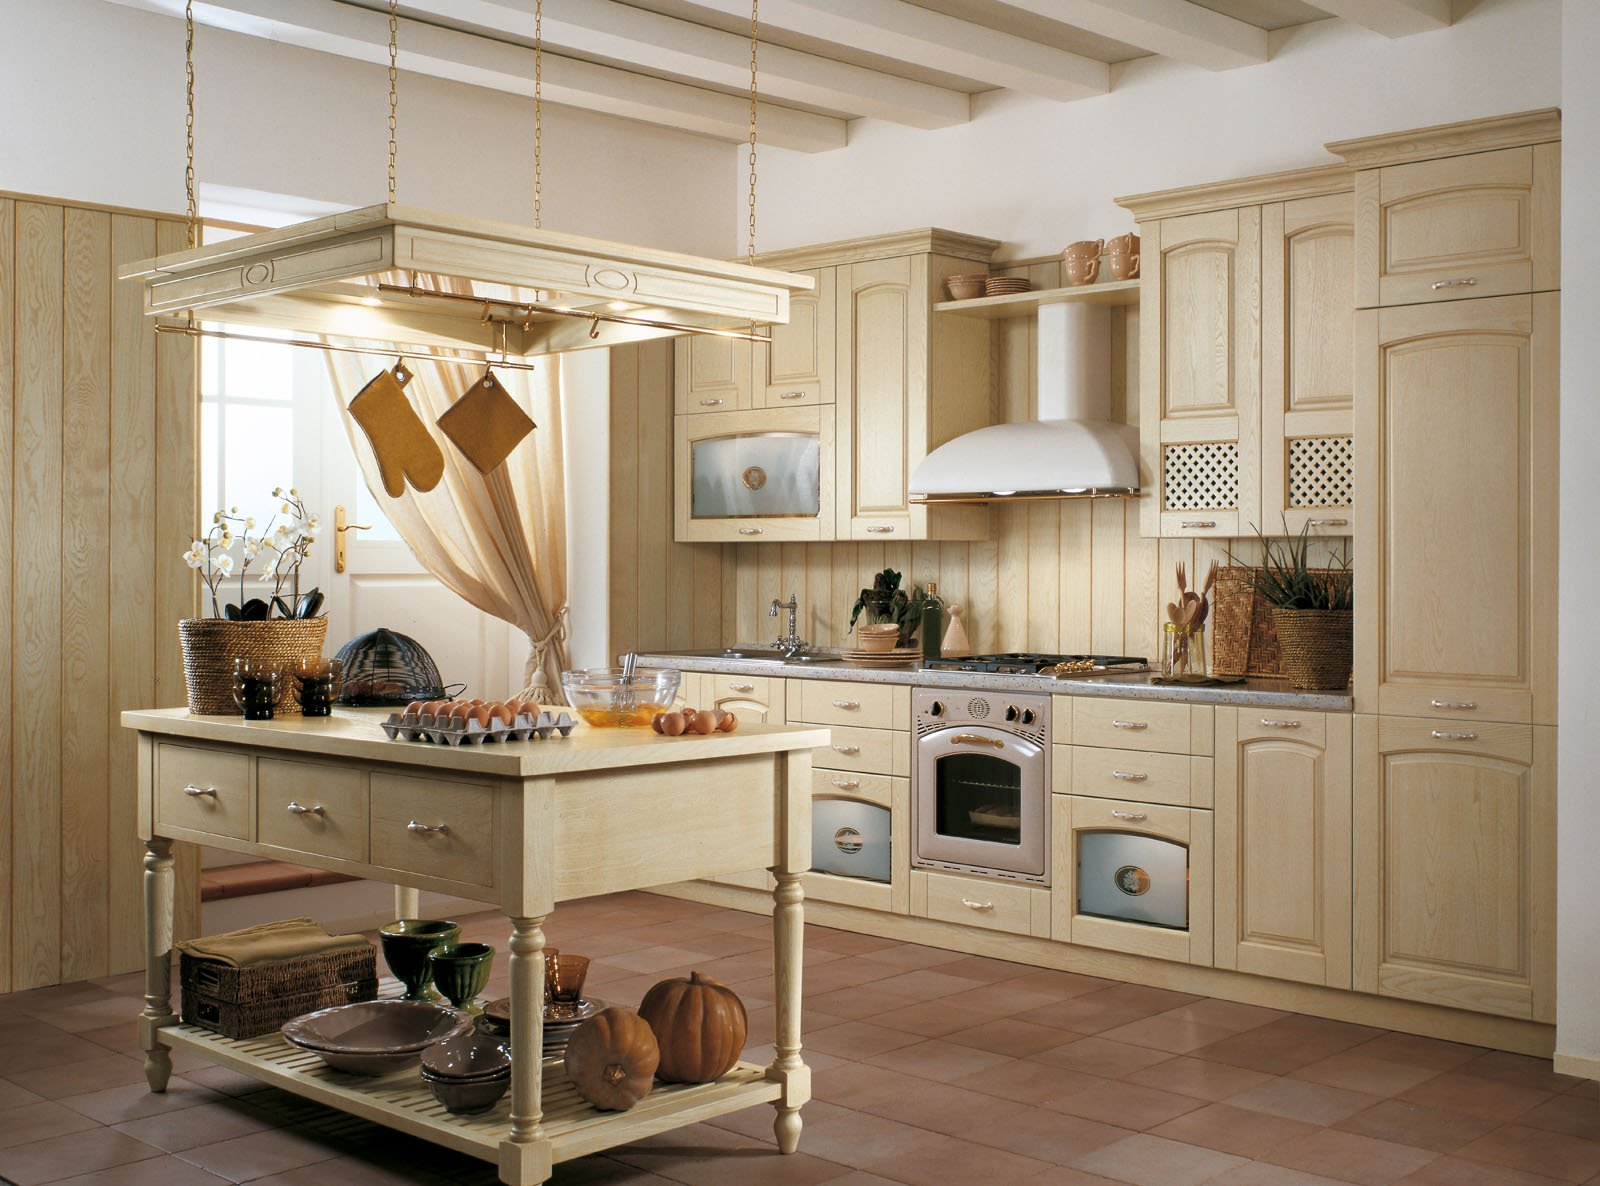 Cucine country una scelta di stile cose di casa for Piani di casa in stile rambler